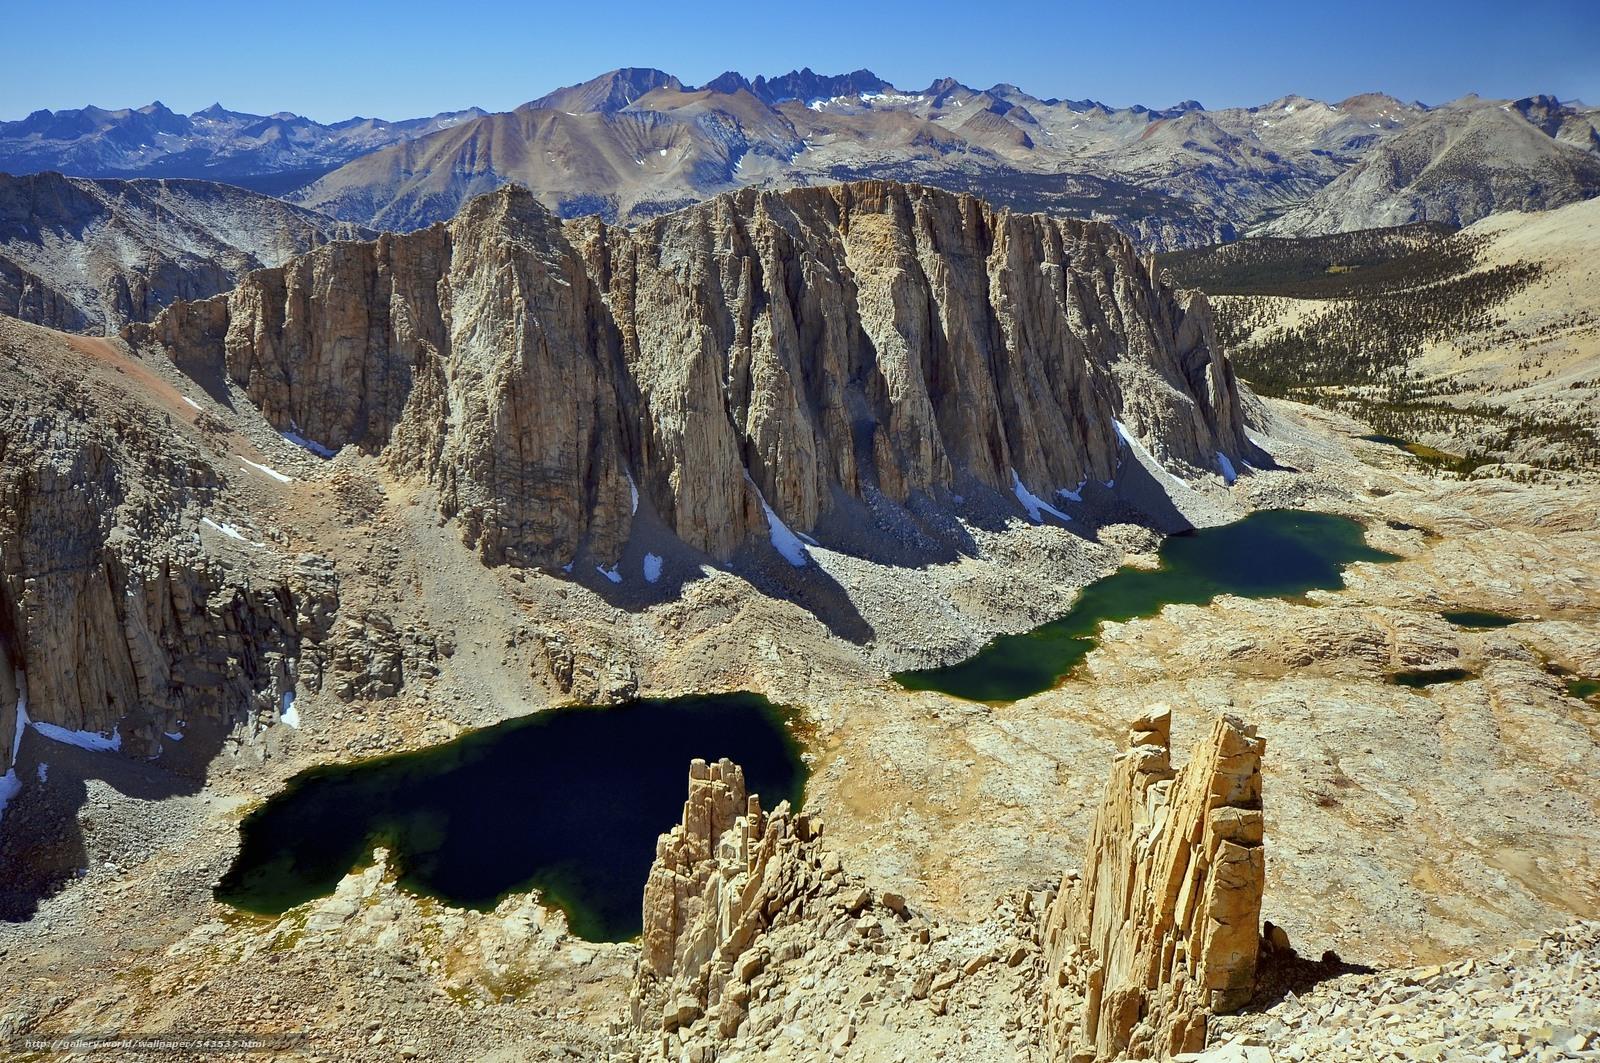 Download wallpaper Hitchcock Lake Sequoia National Park landscape 1600x1063